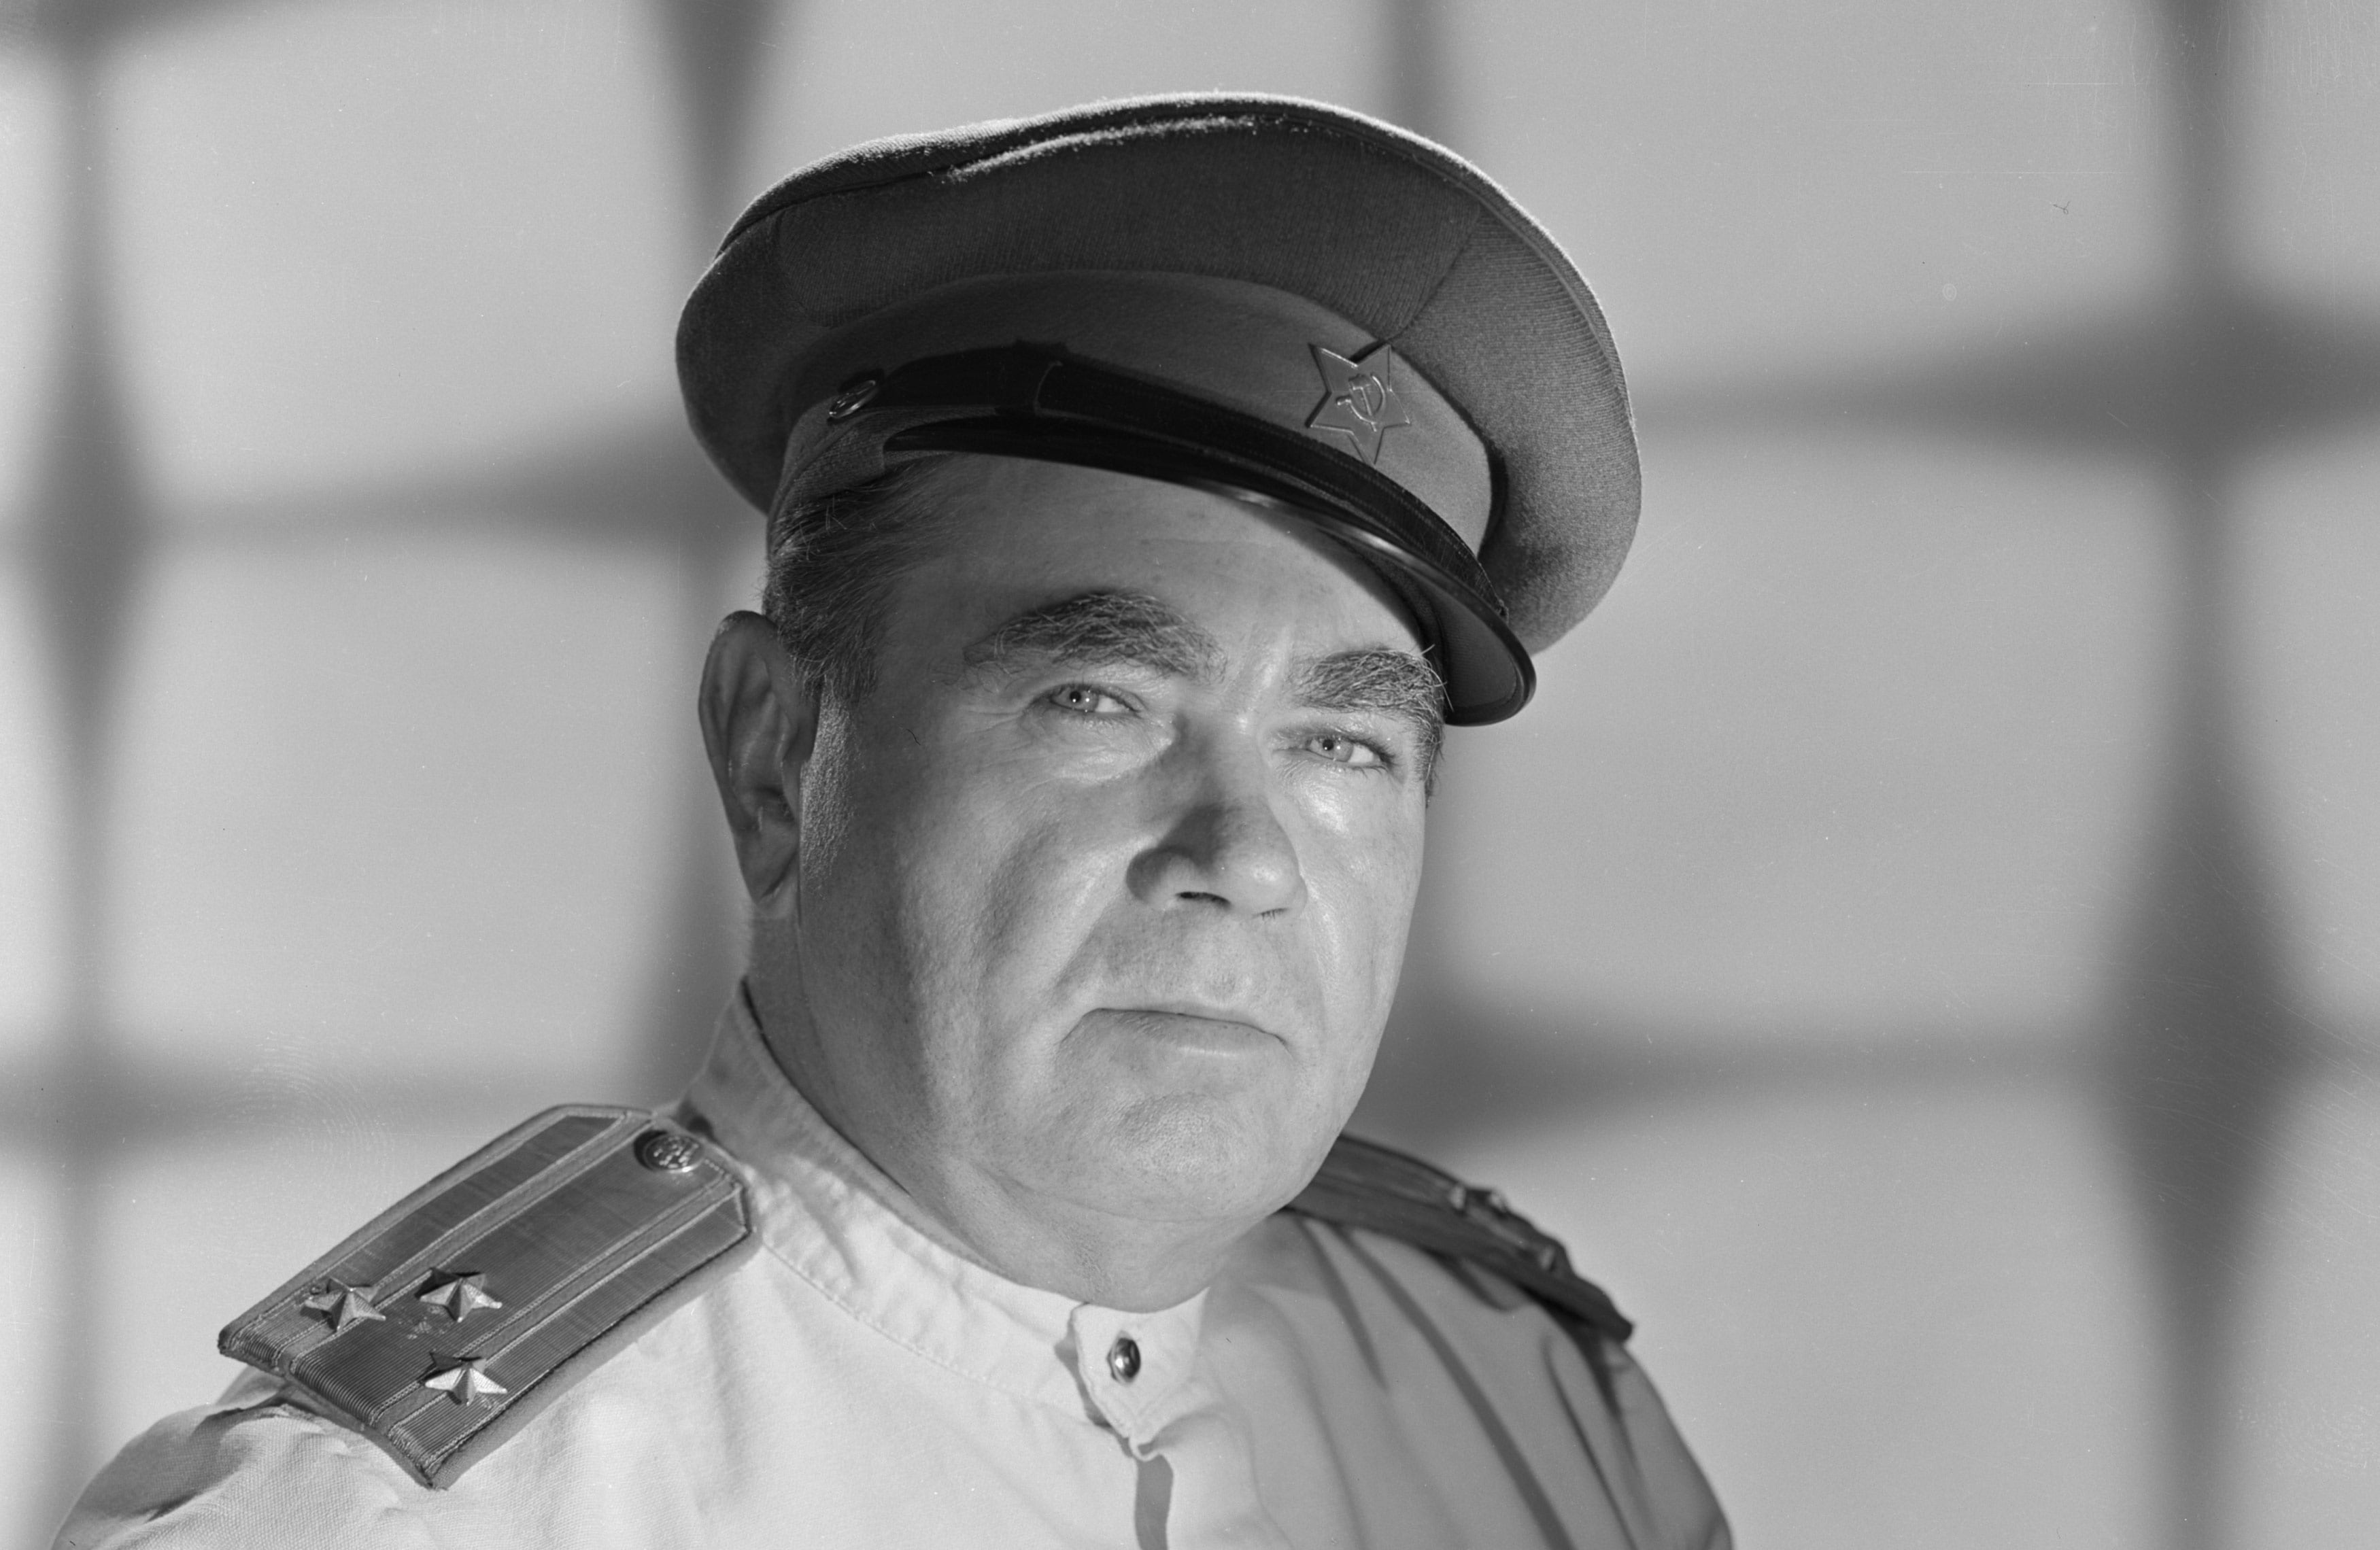 Oscar Homolka